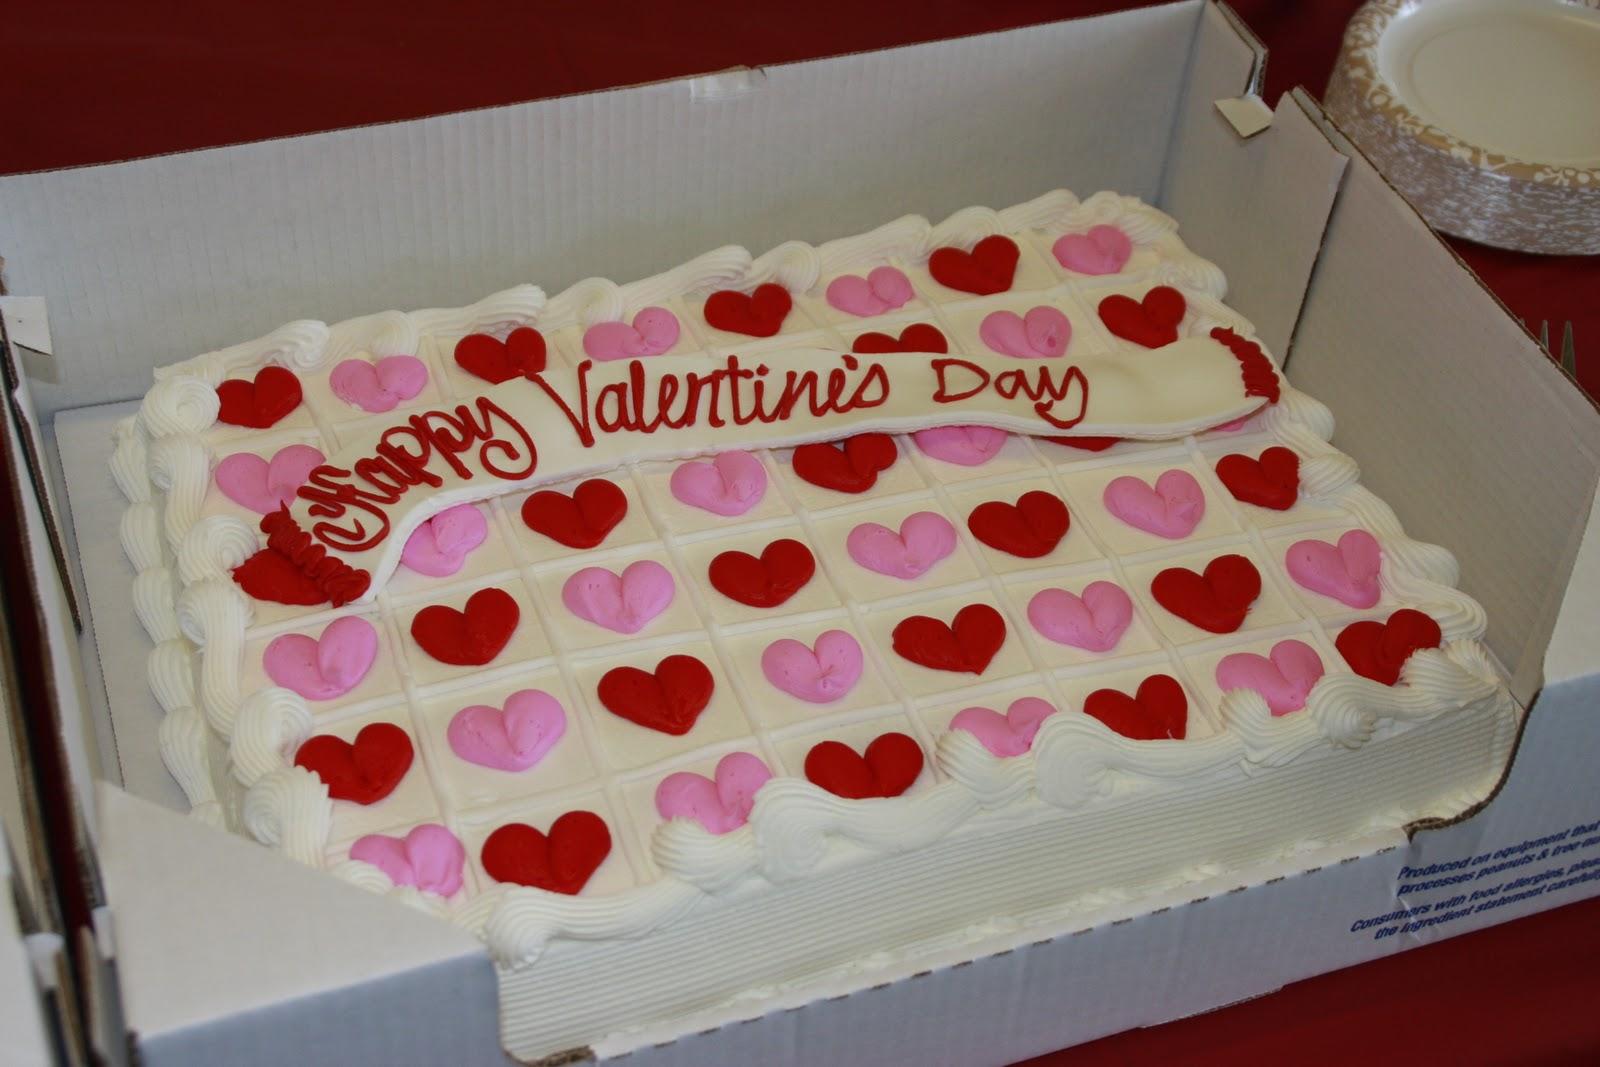 Happy 10th Anniversary Cake Ideas and Designs